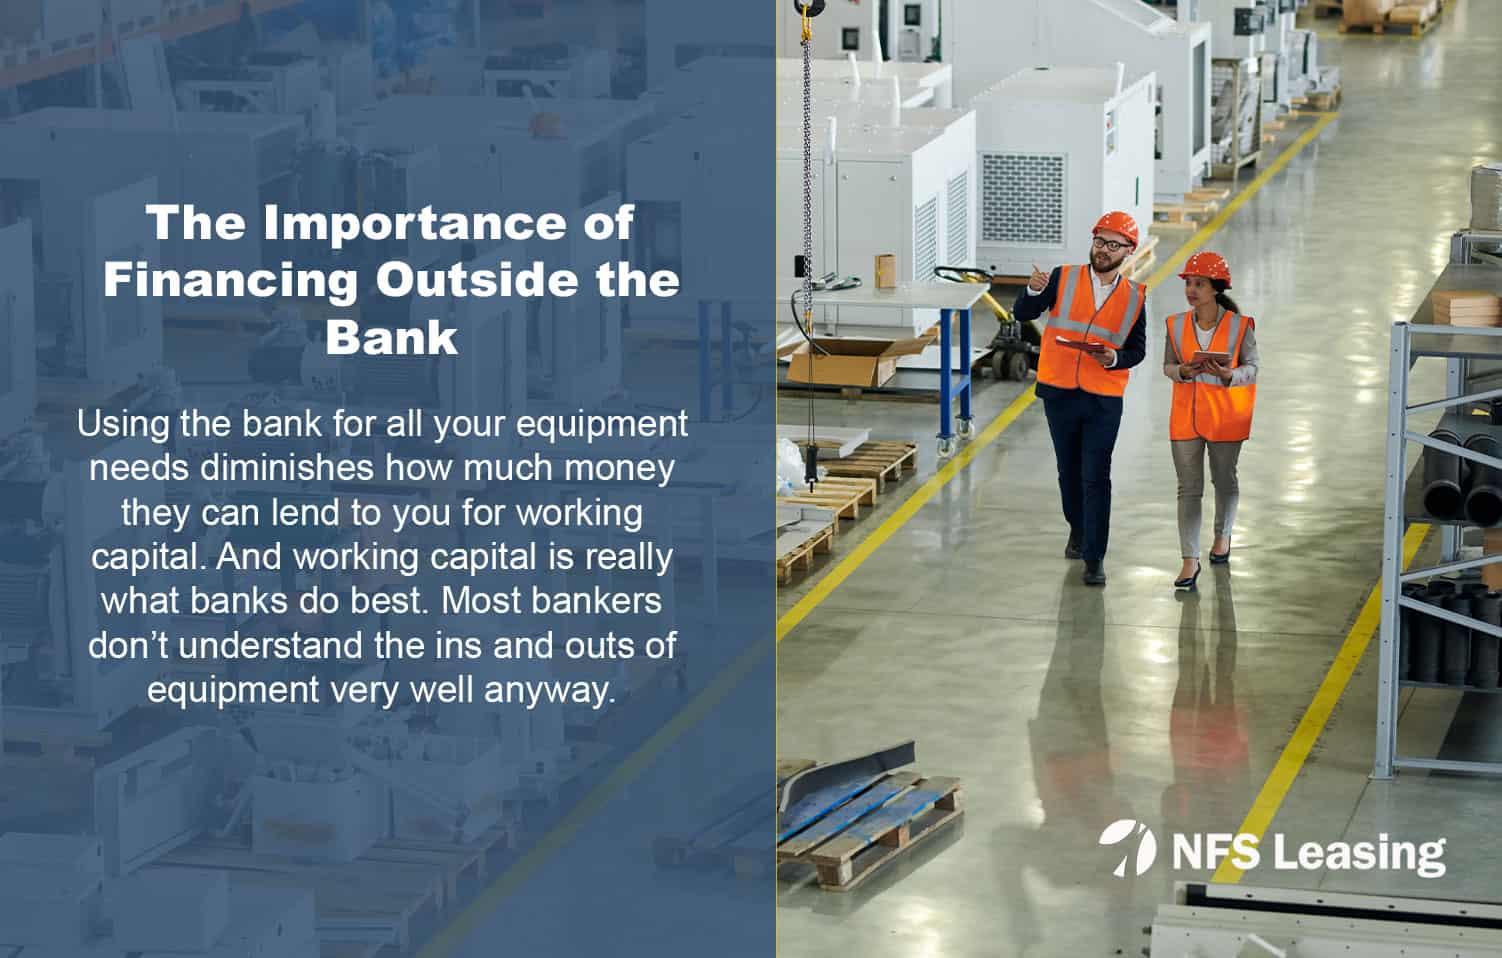 Financing Equipment Outside the Bank